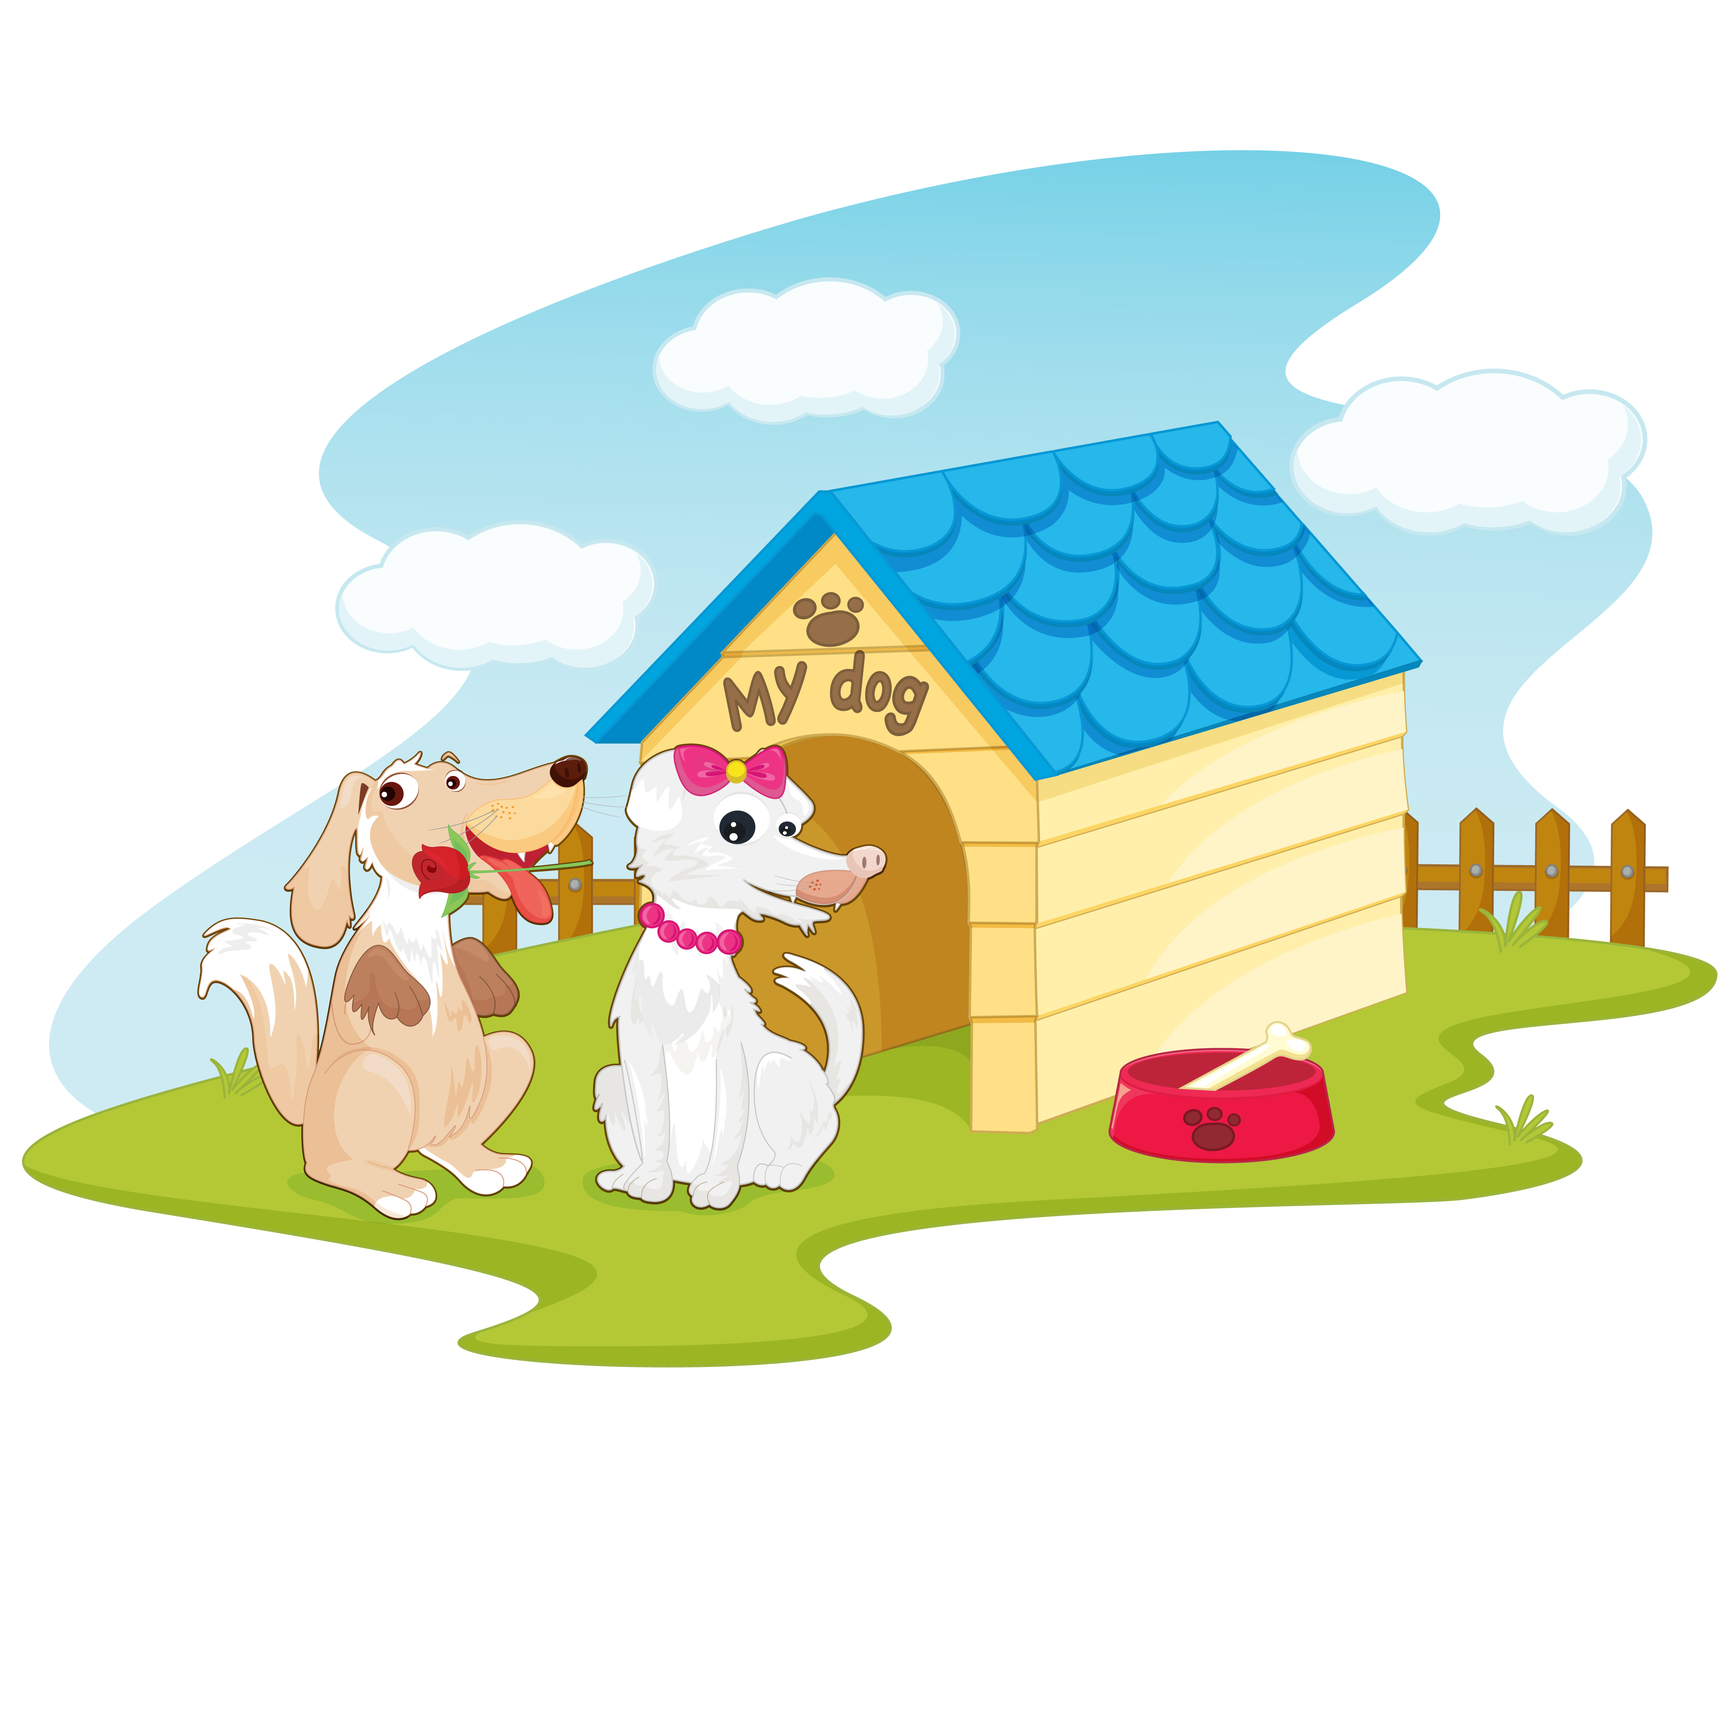 Dog's House, Dish and Bone